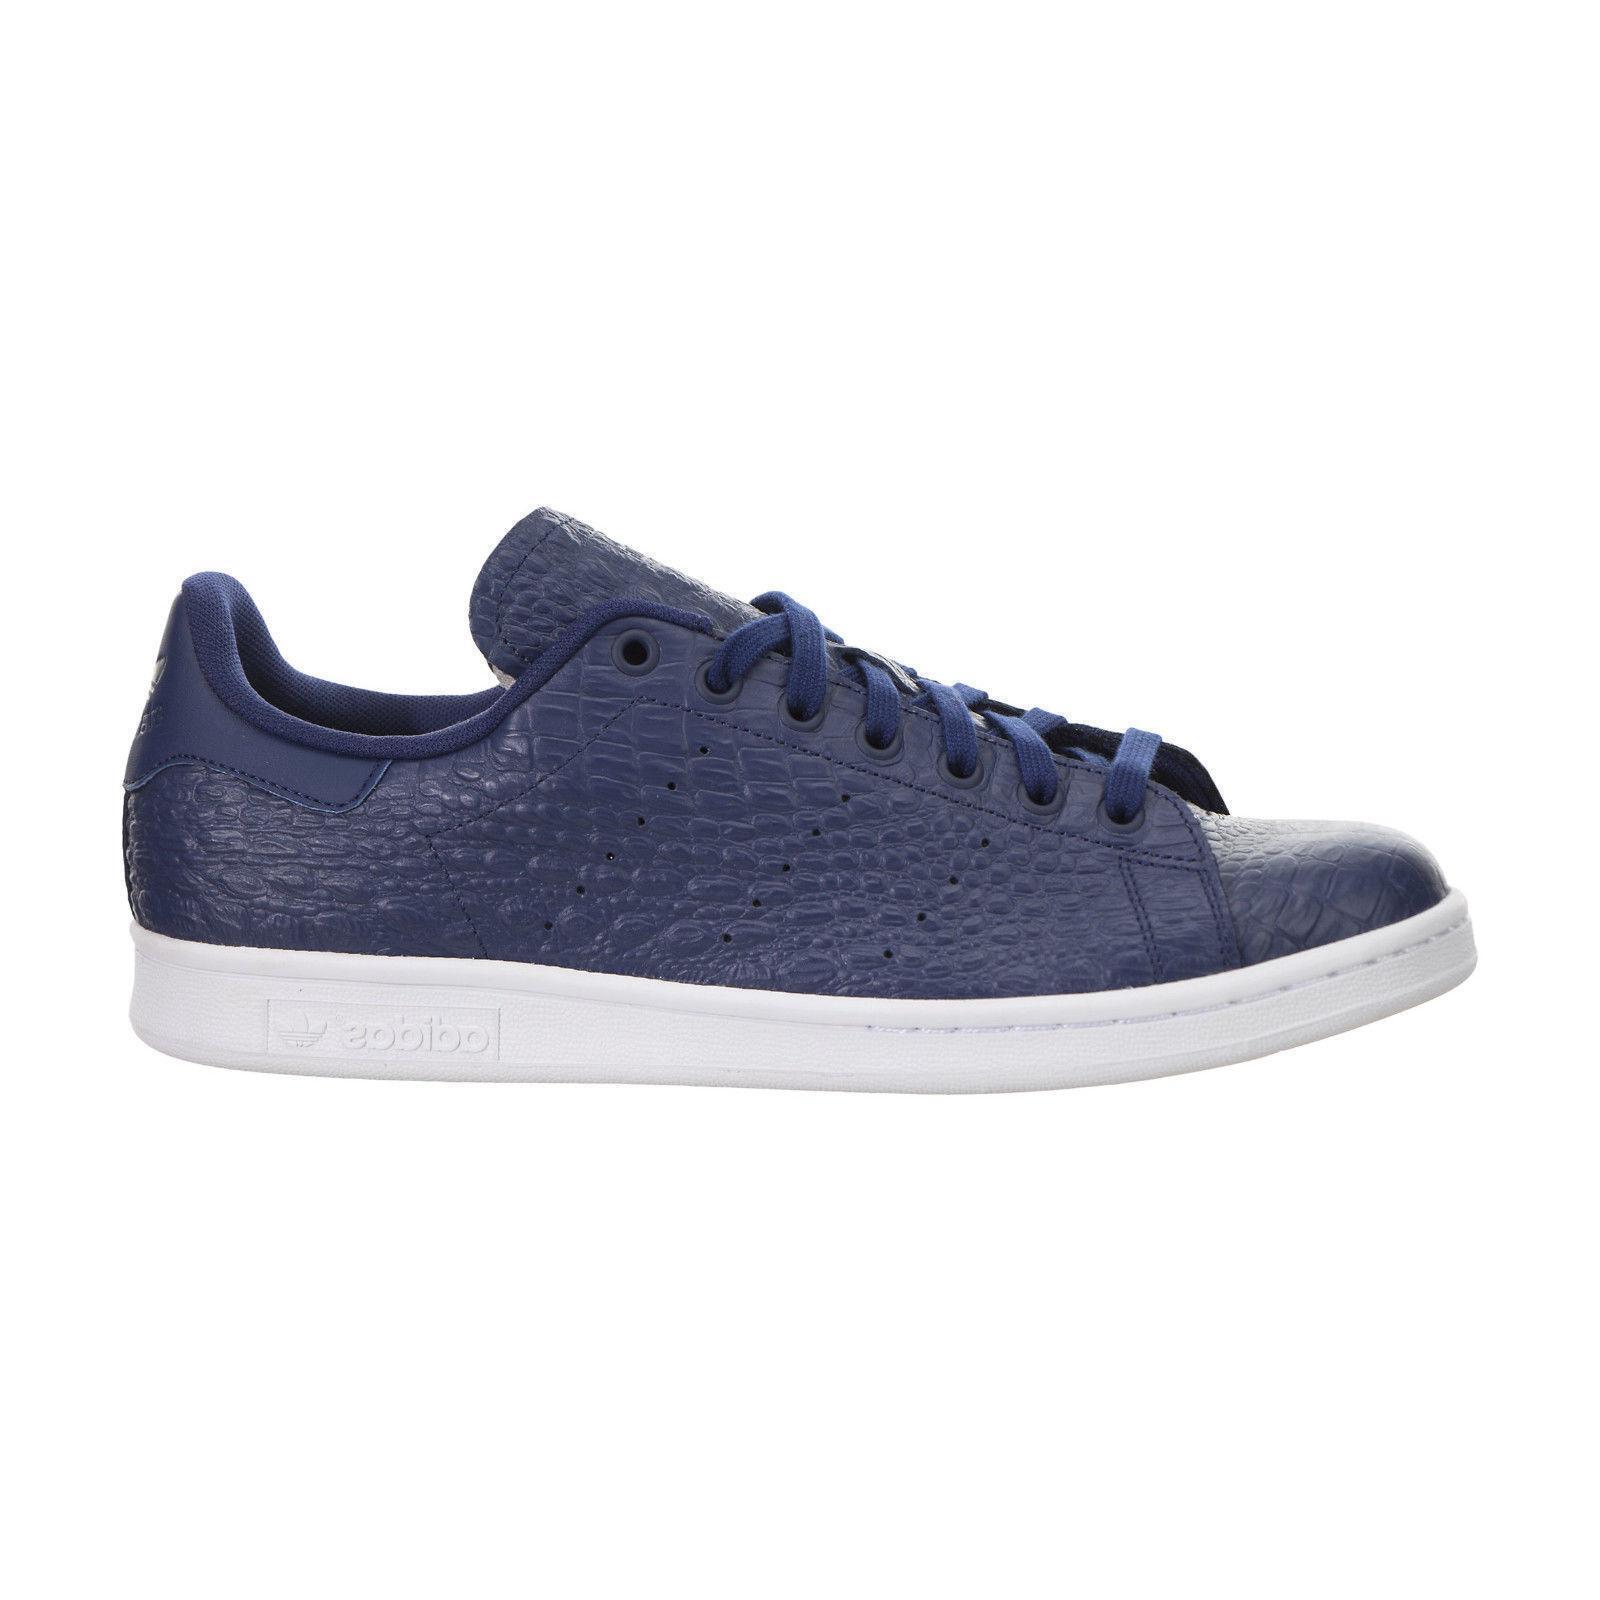 adidas stan smith dark blue, Livraison Gratuite! Numéro de